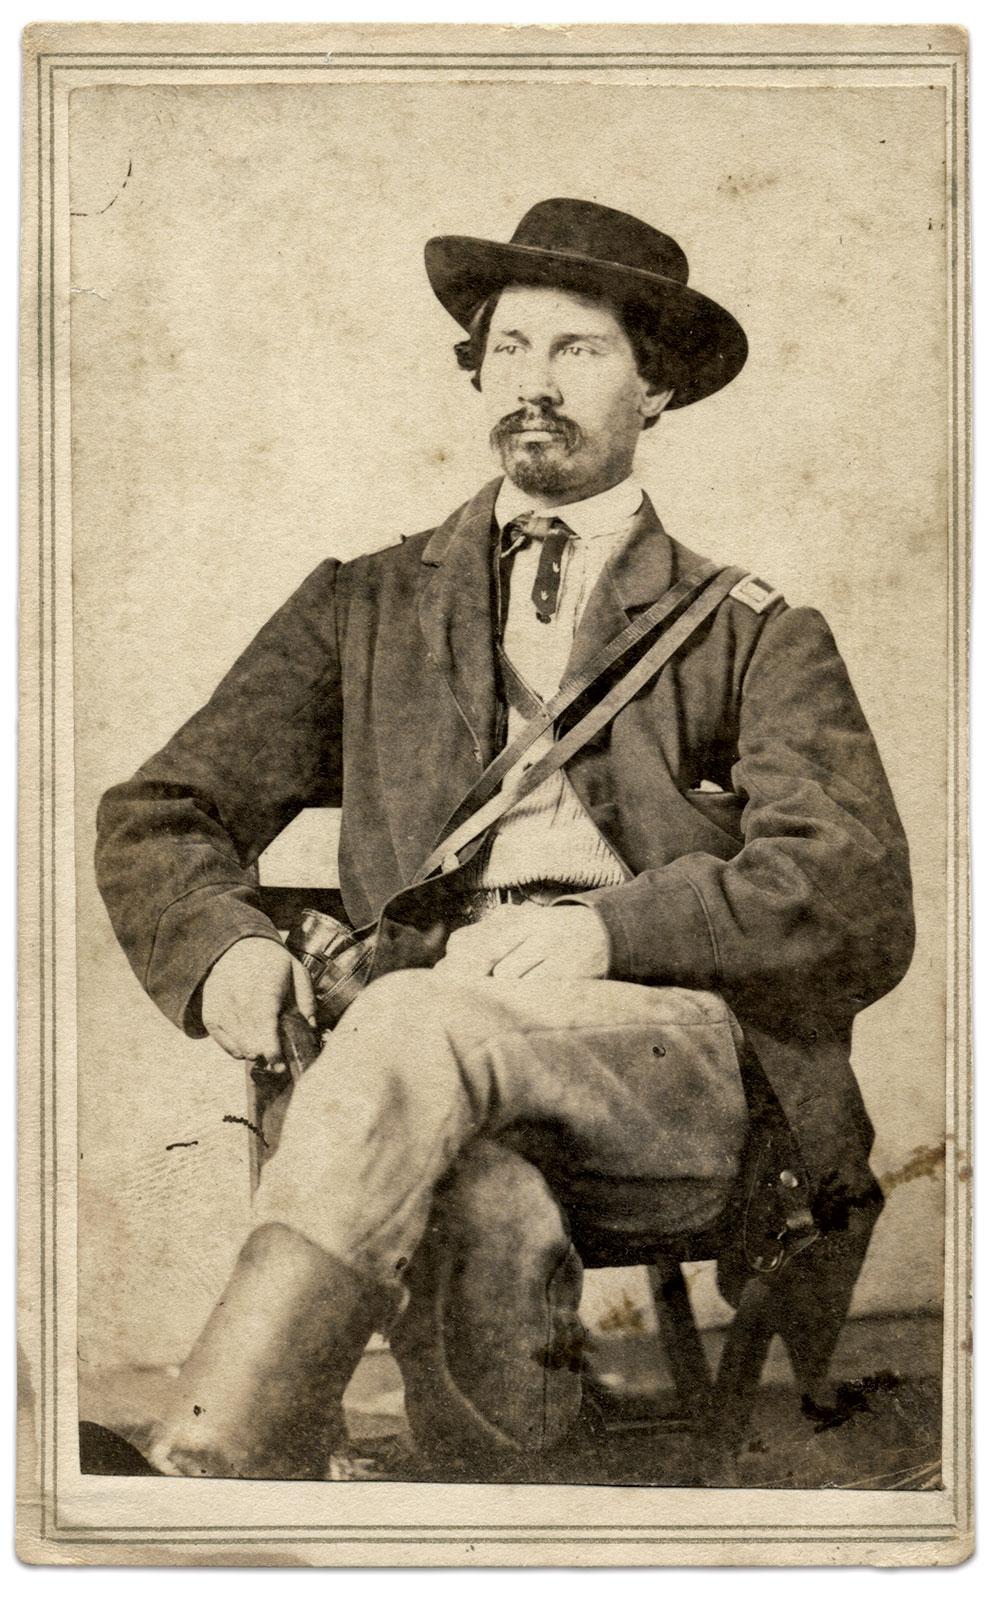 Carte de visite by Theodore M. Schleier of Nashville, Tenn. Rick Carlile Collection.